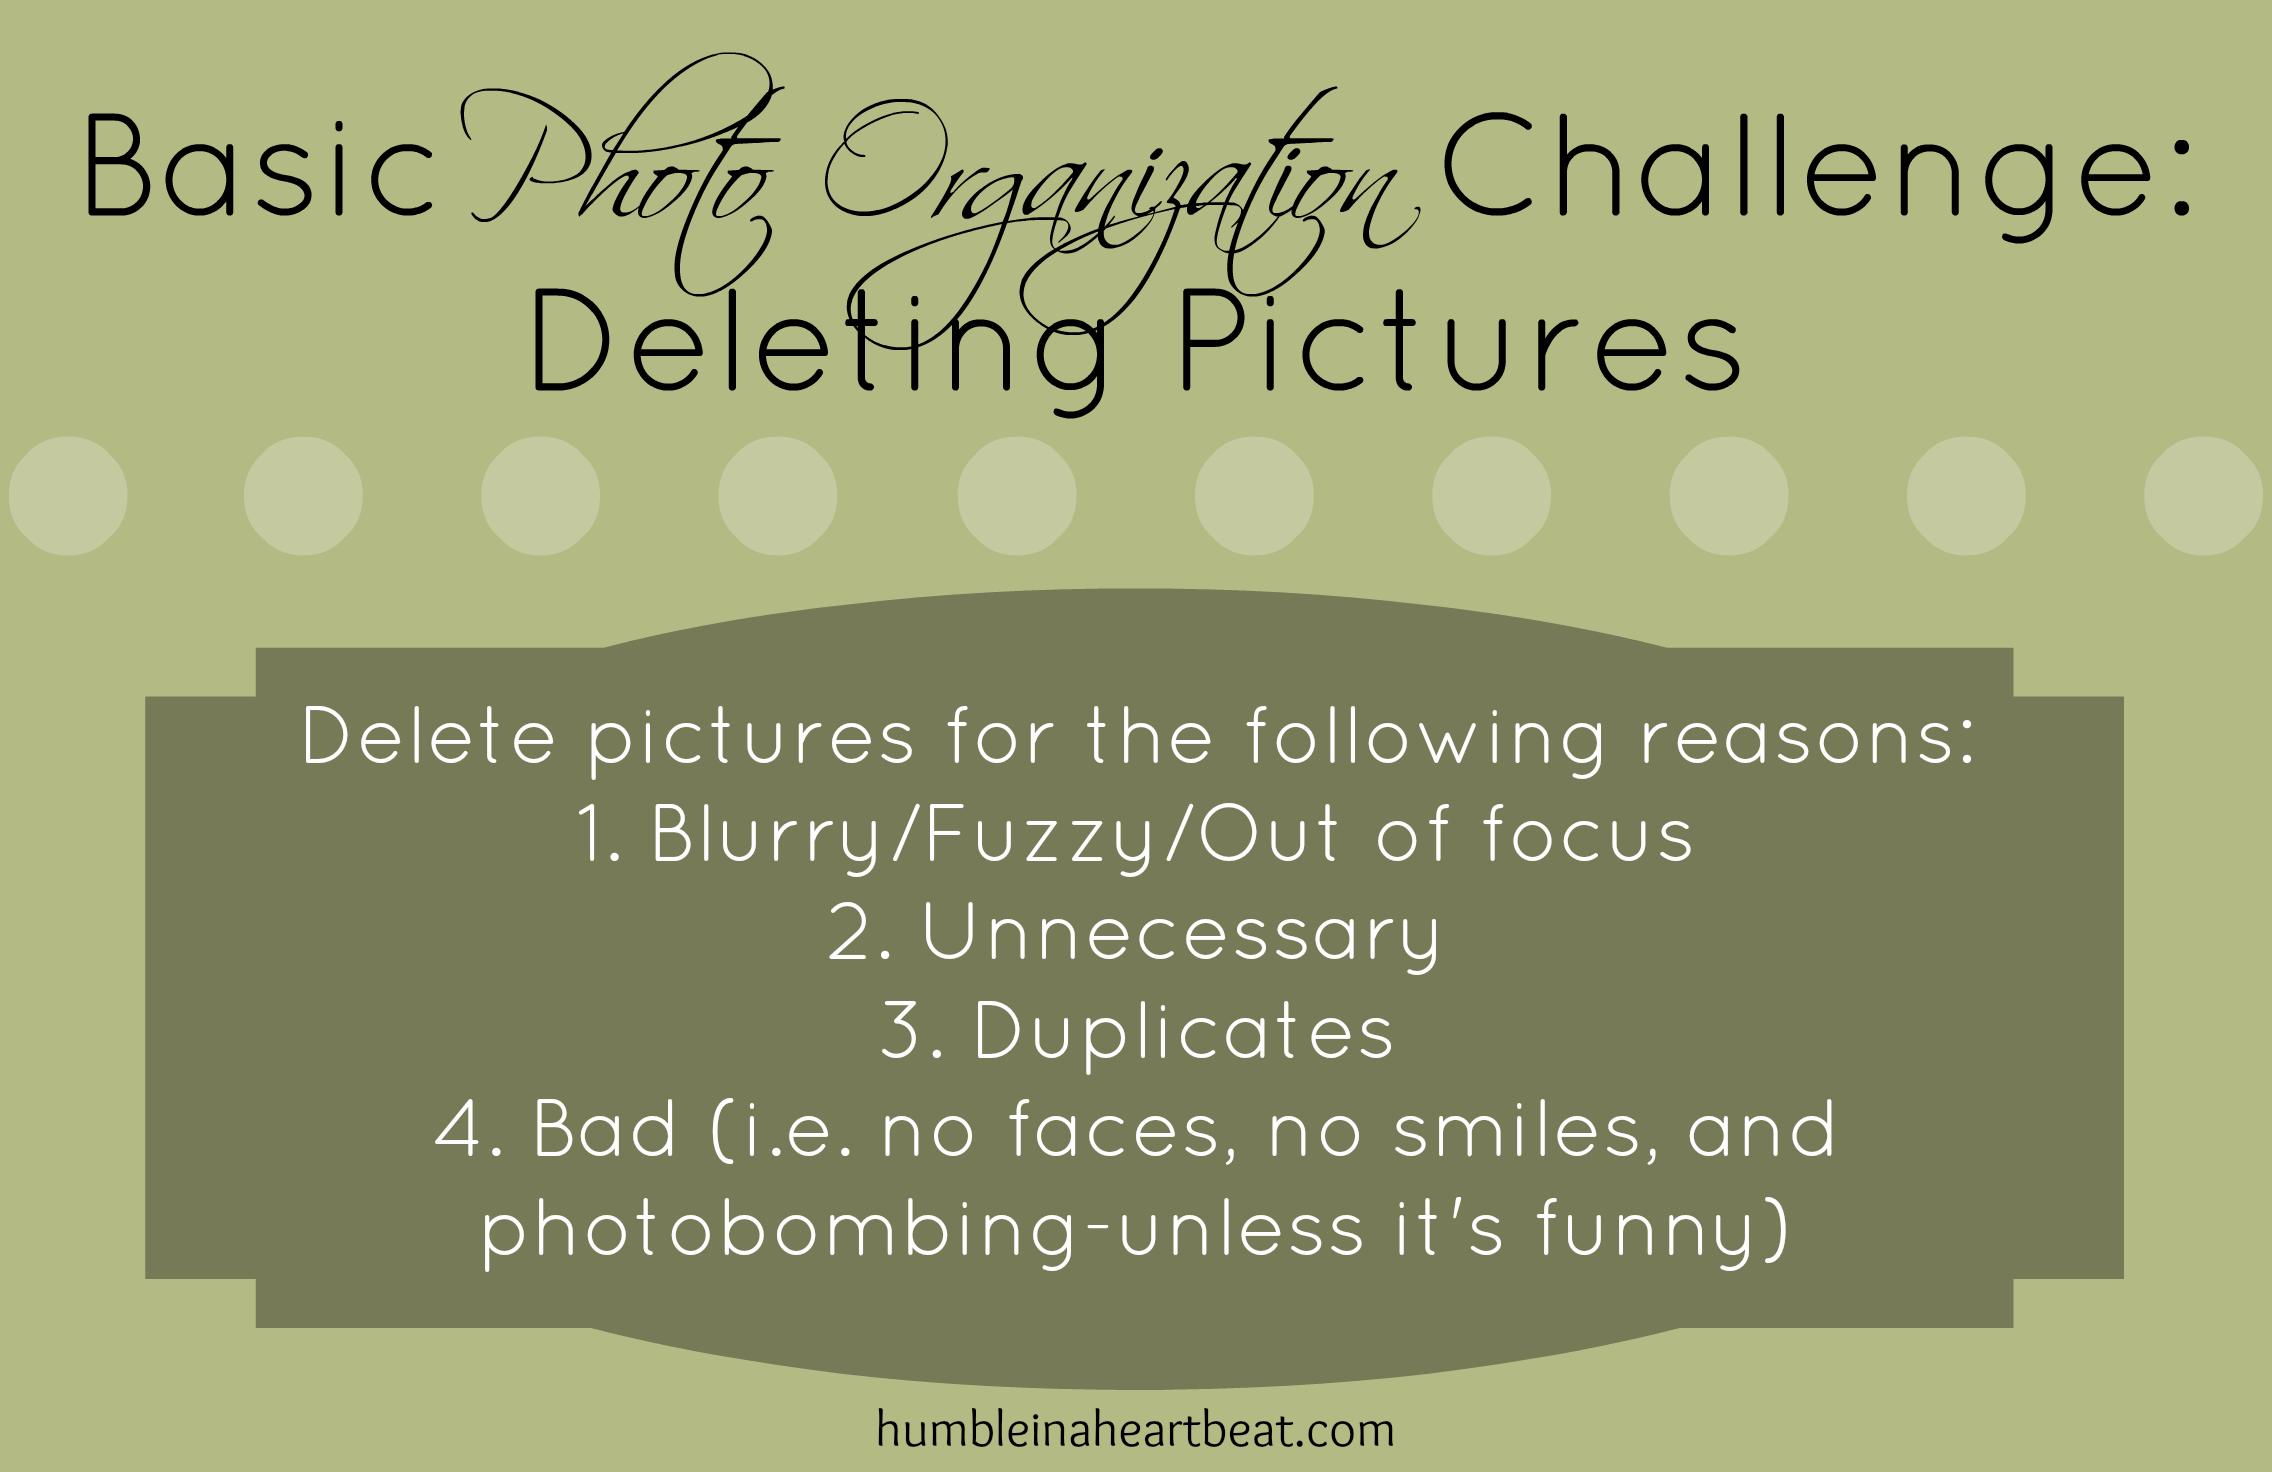 Basic Photo Organization Challenge: Deleting Pictures (part 2)